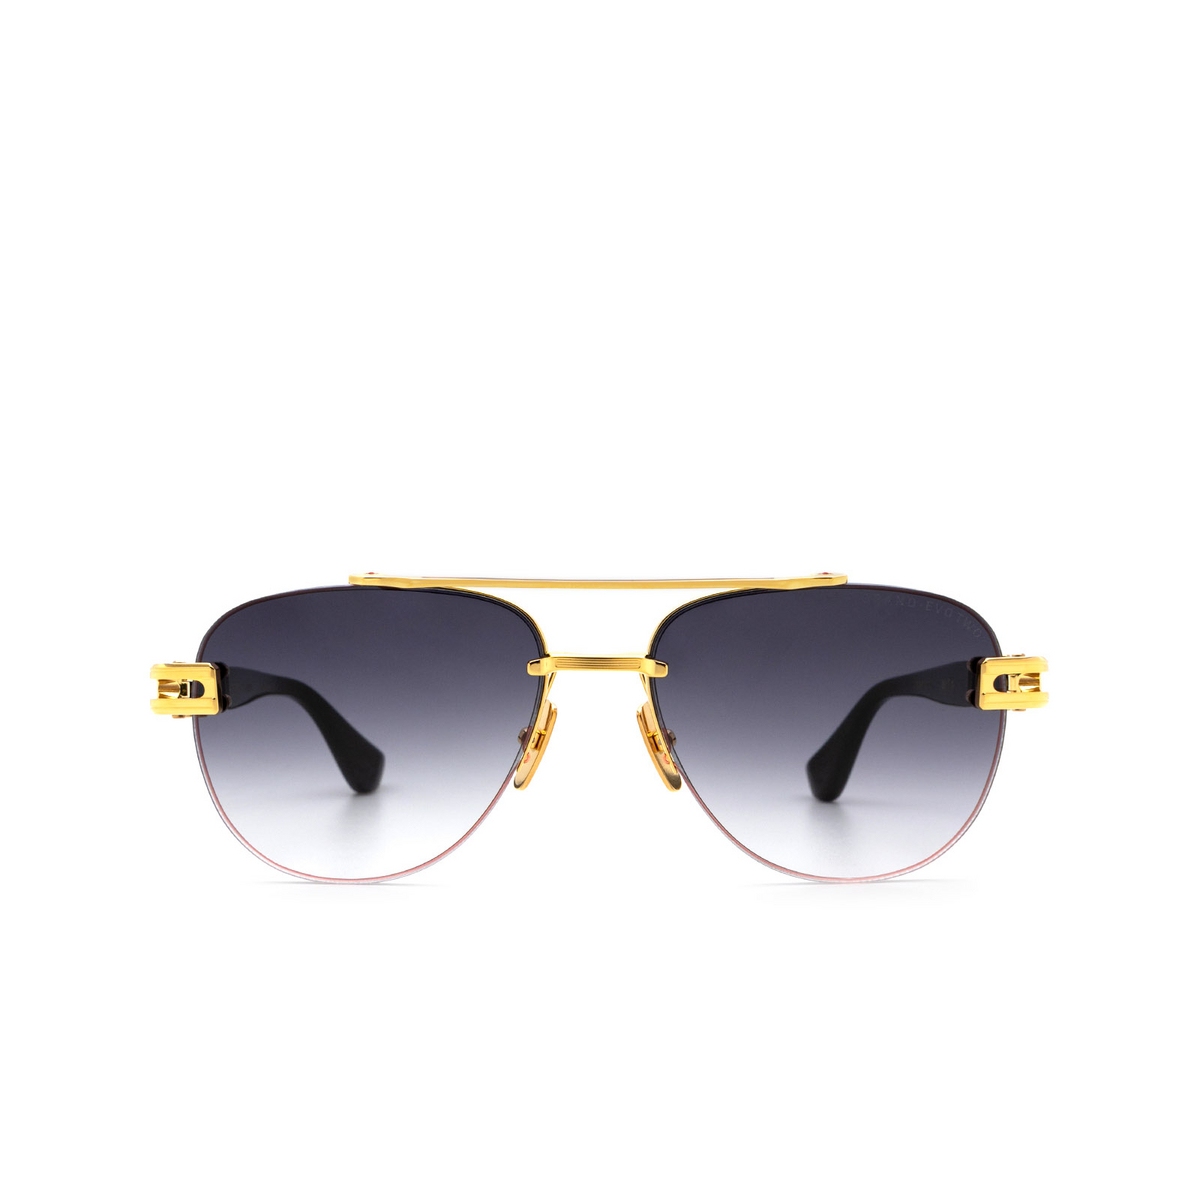 Dita® Aviator Sunglasses: Grand-evo Two DTS139-A-01-Z color Gold Black Gld-blk.